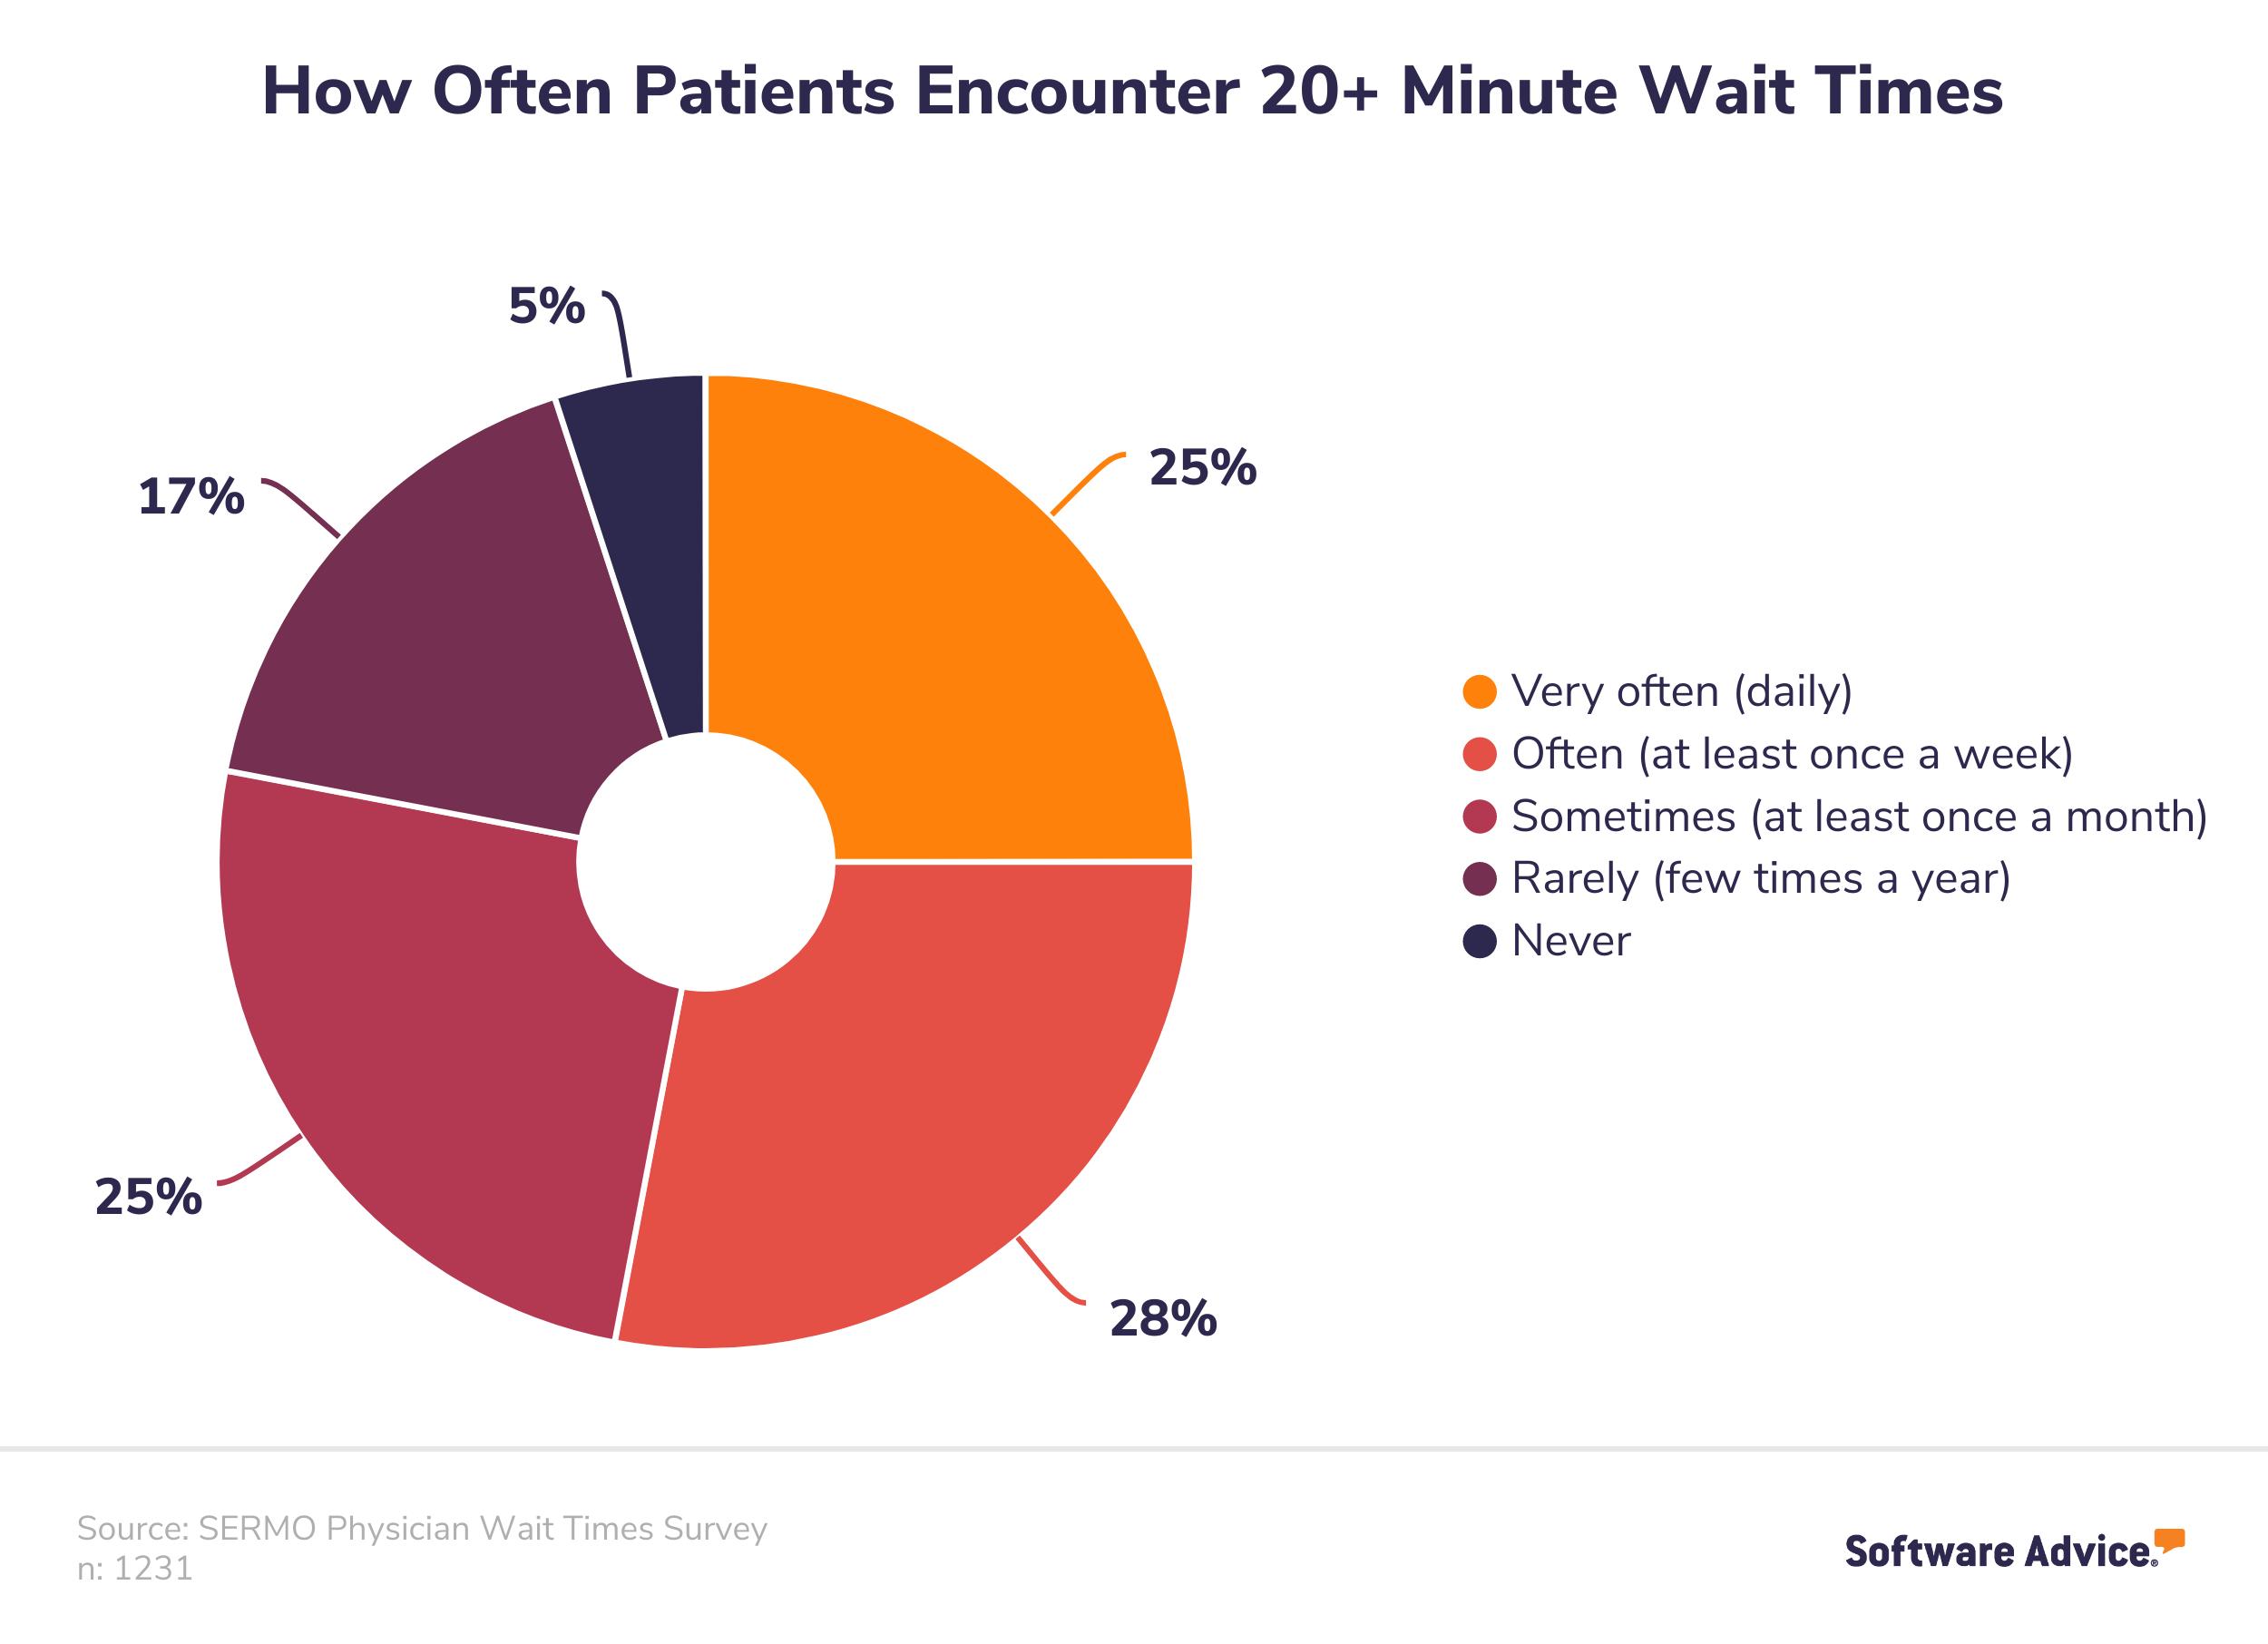 How often patients encounter 20+ minute wait times chart